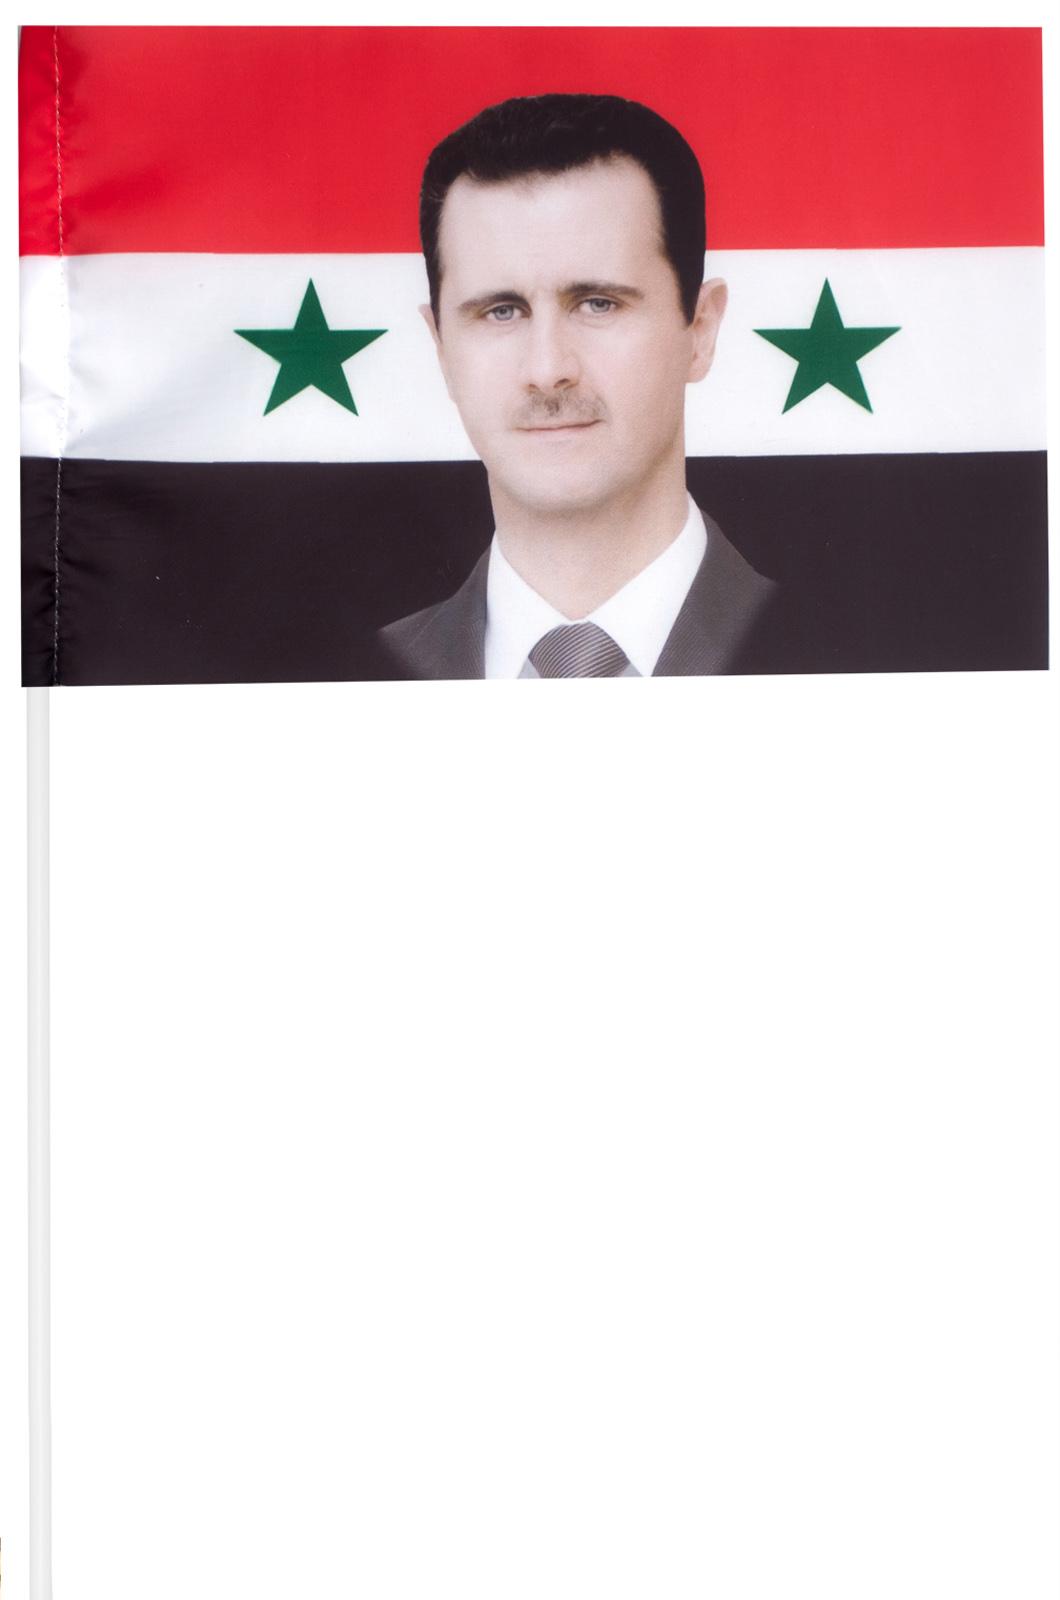 Флажок Сирии с портретом Асада